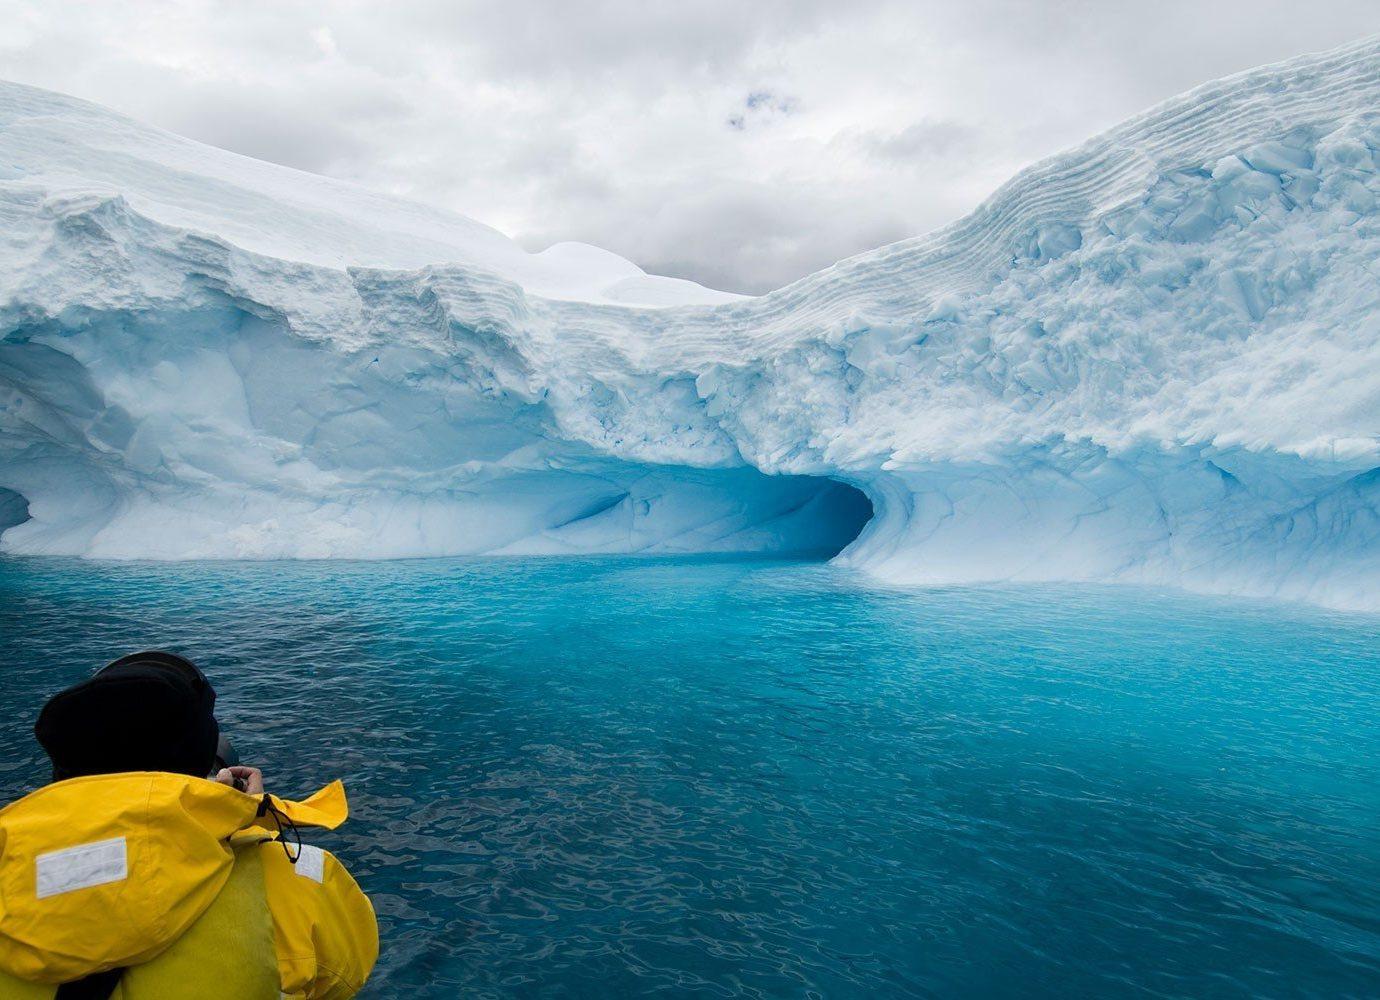 Cruise Travel Trip Ideas water outdoor Nature iceberg mountain ice Ocean Sea wind wave arctic arctic ocean fjord wave yellow sea ice extreme sport glacial landform glacier computer wallpaper